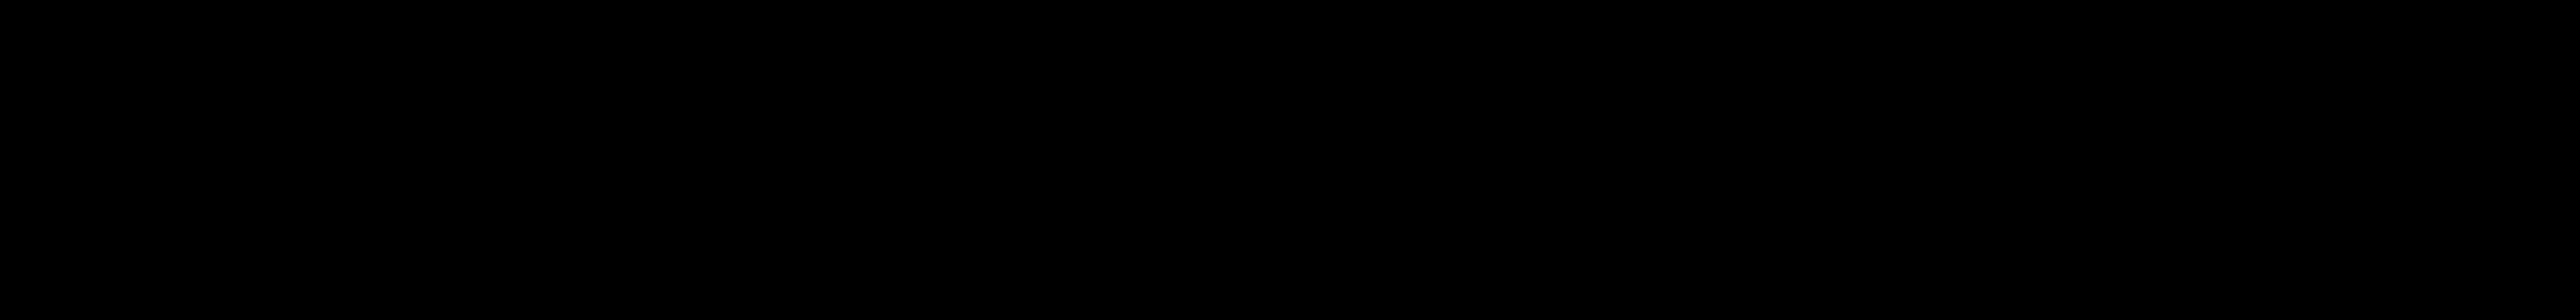 polski producent tubiarek